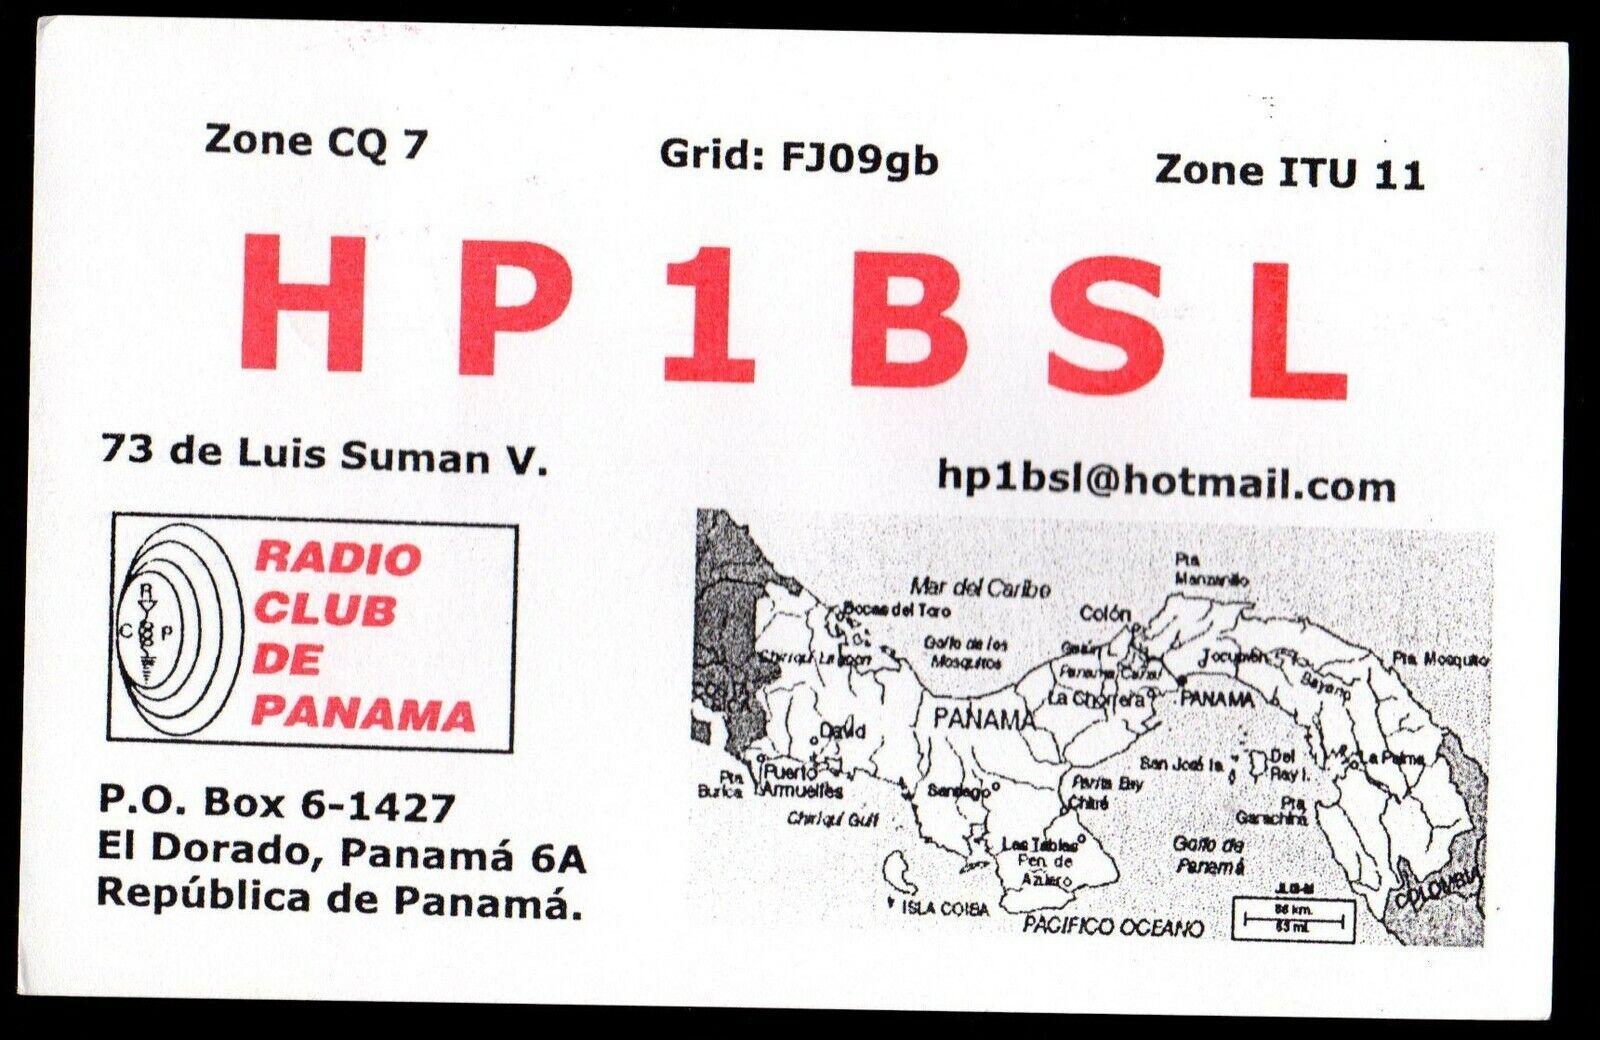 QSL QSO RADIO CARD Map of Panama,Luis Suman V.,HP1BSL, (Q3051)